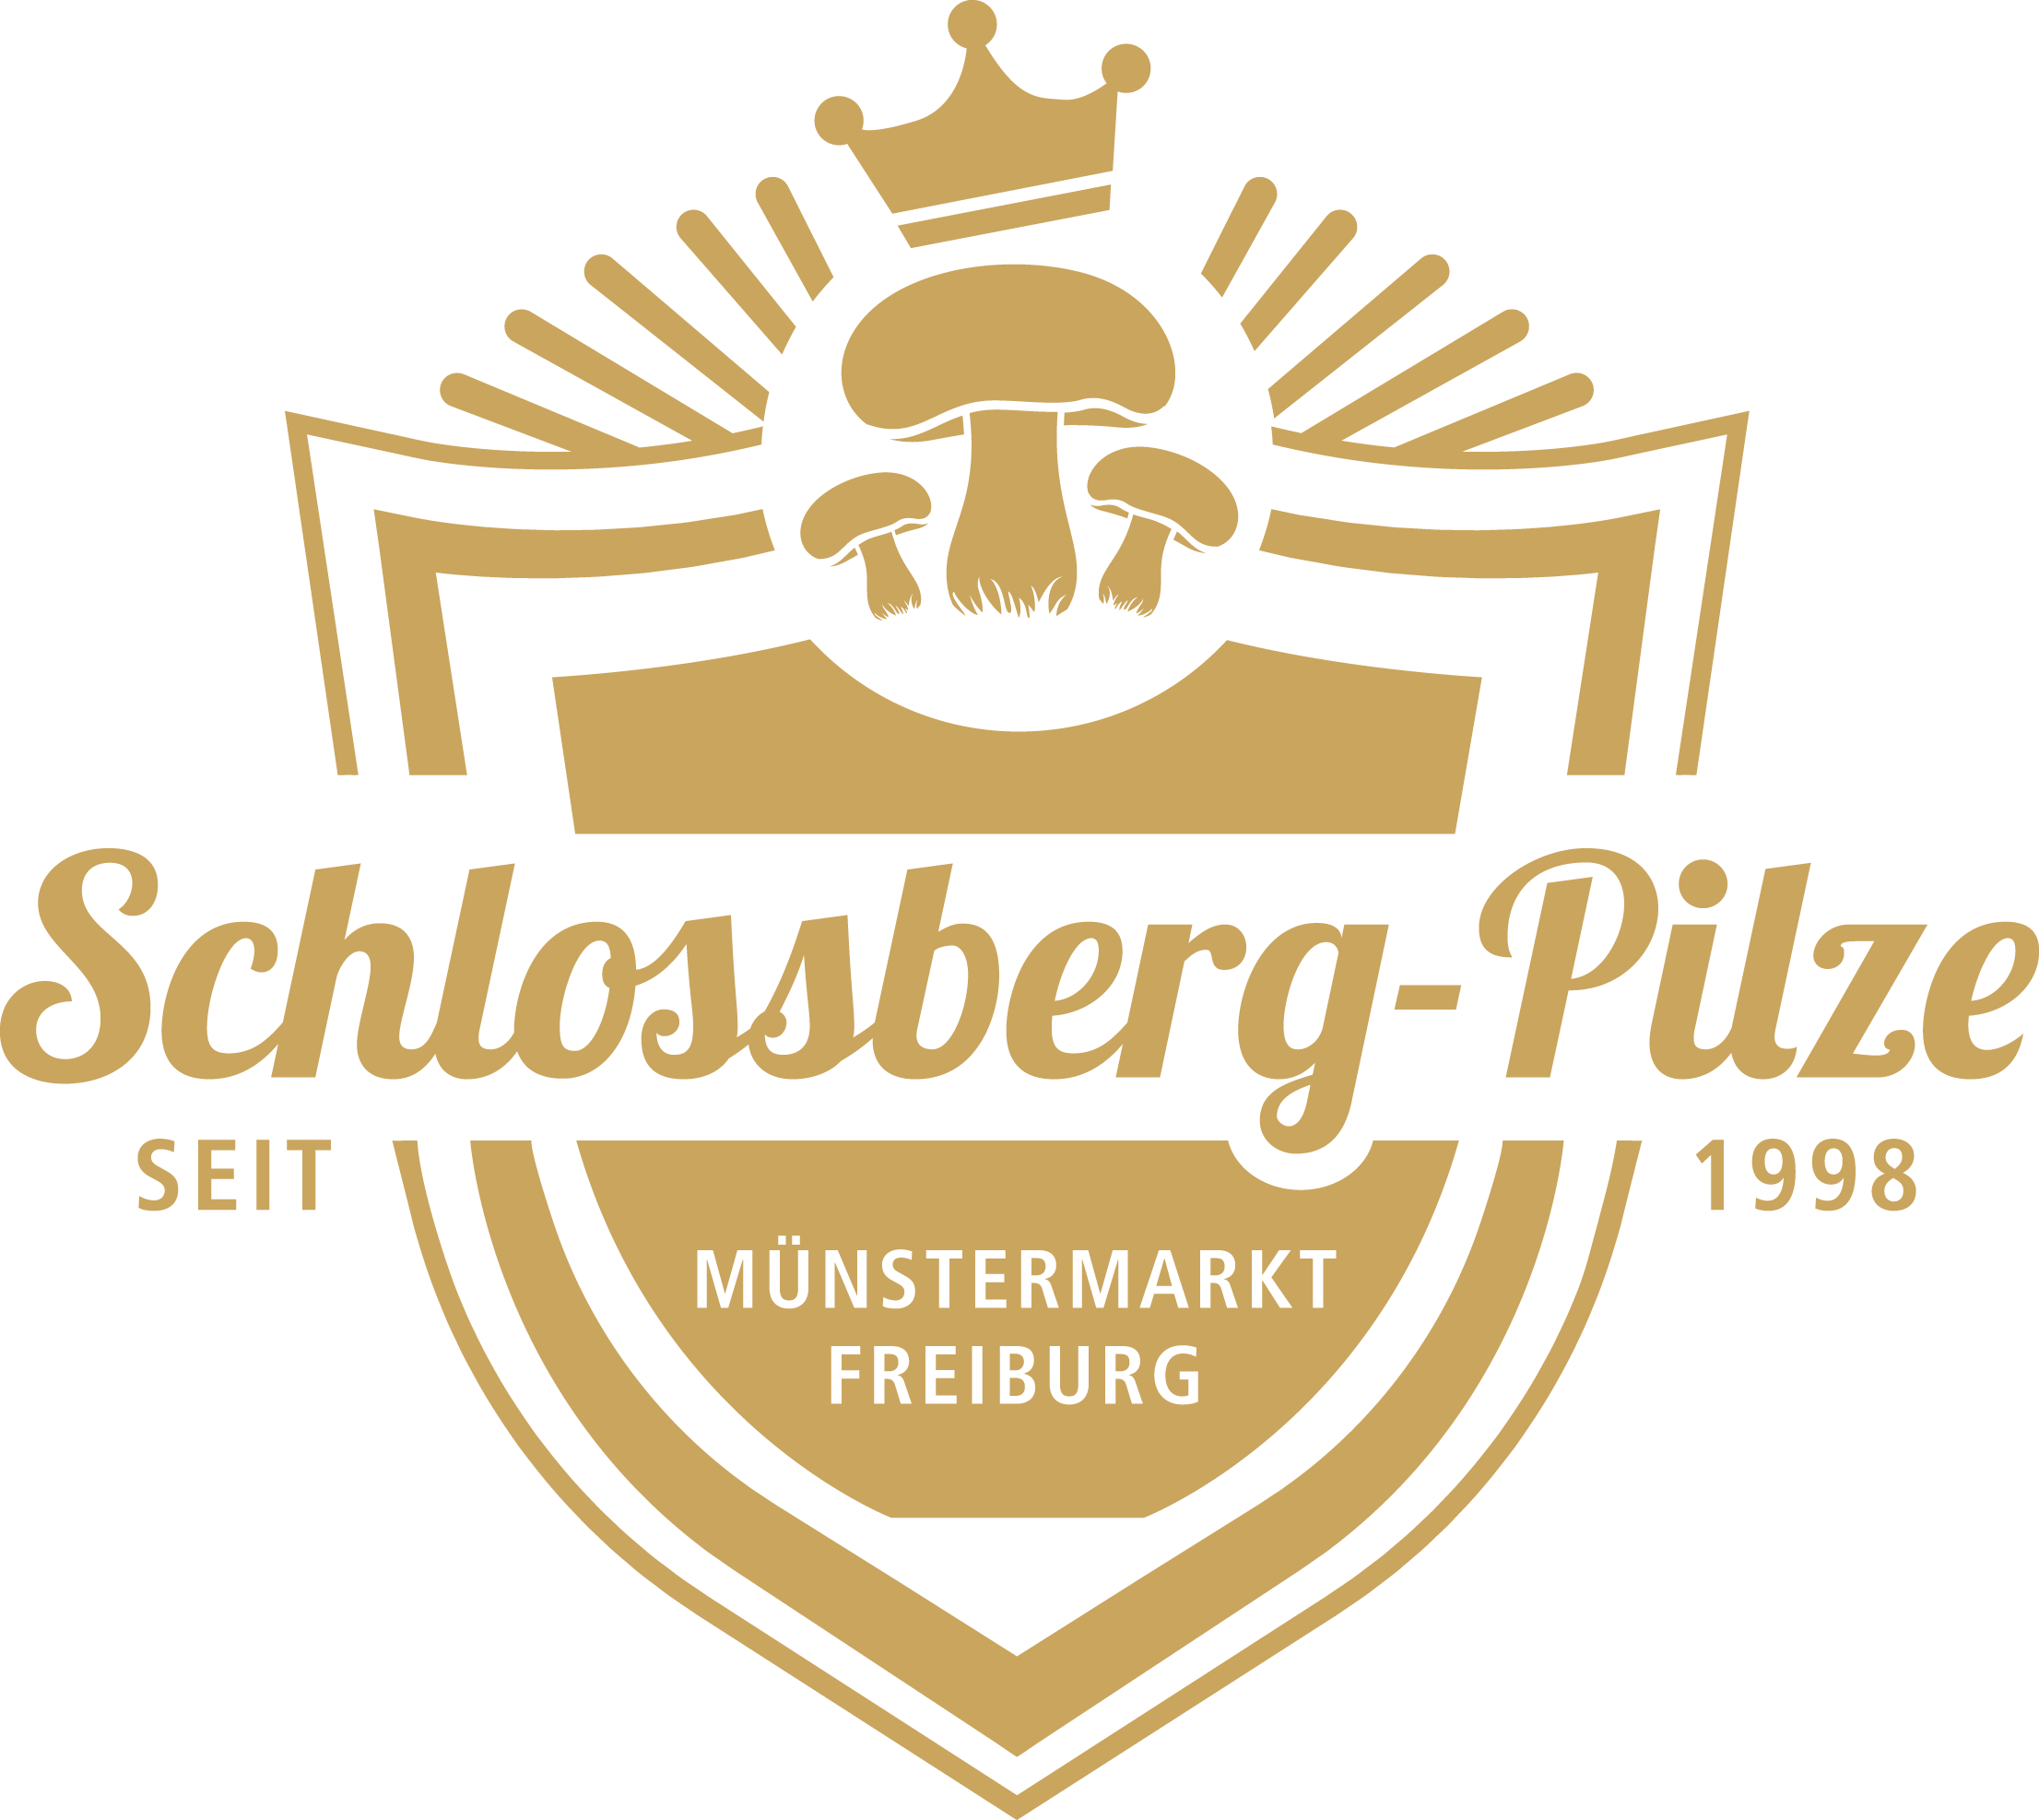 Schlossberg Pilze Freiburg